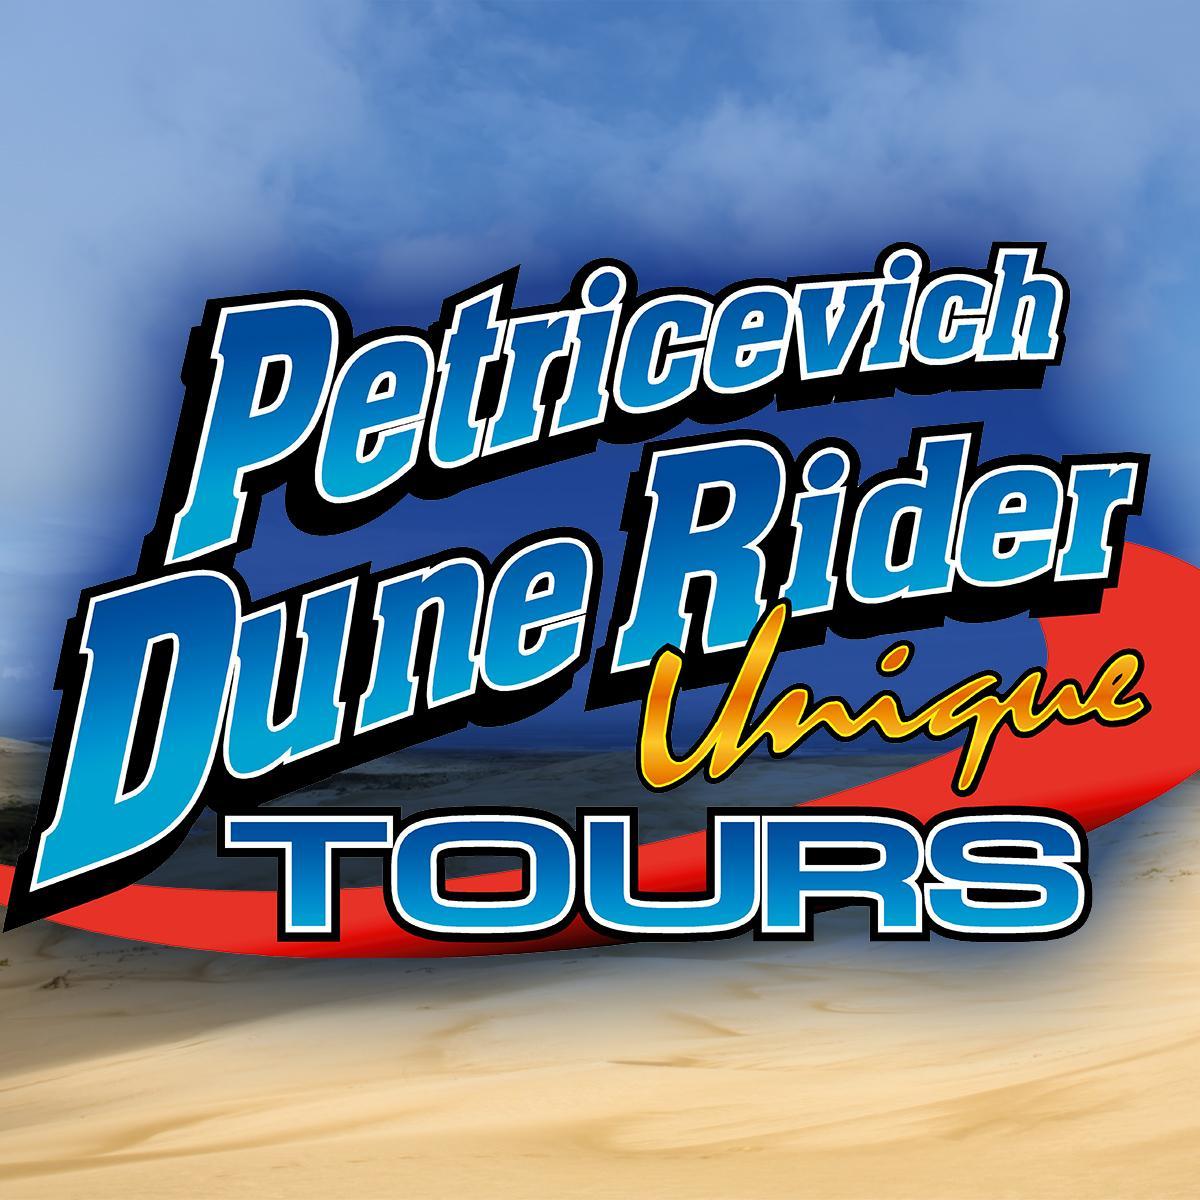 Petricevich Dune Rider Kaitaia